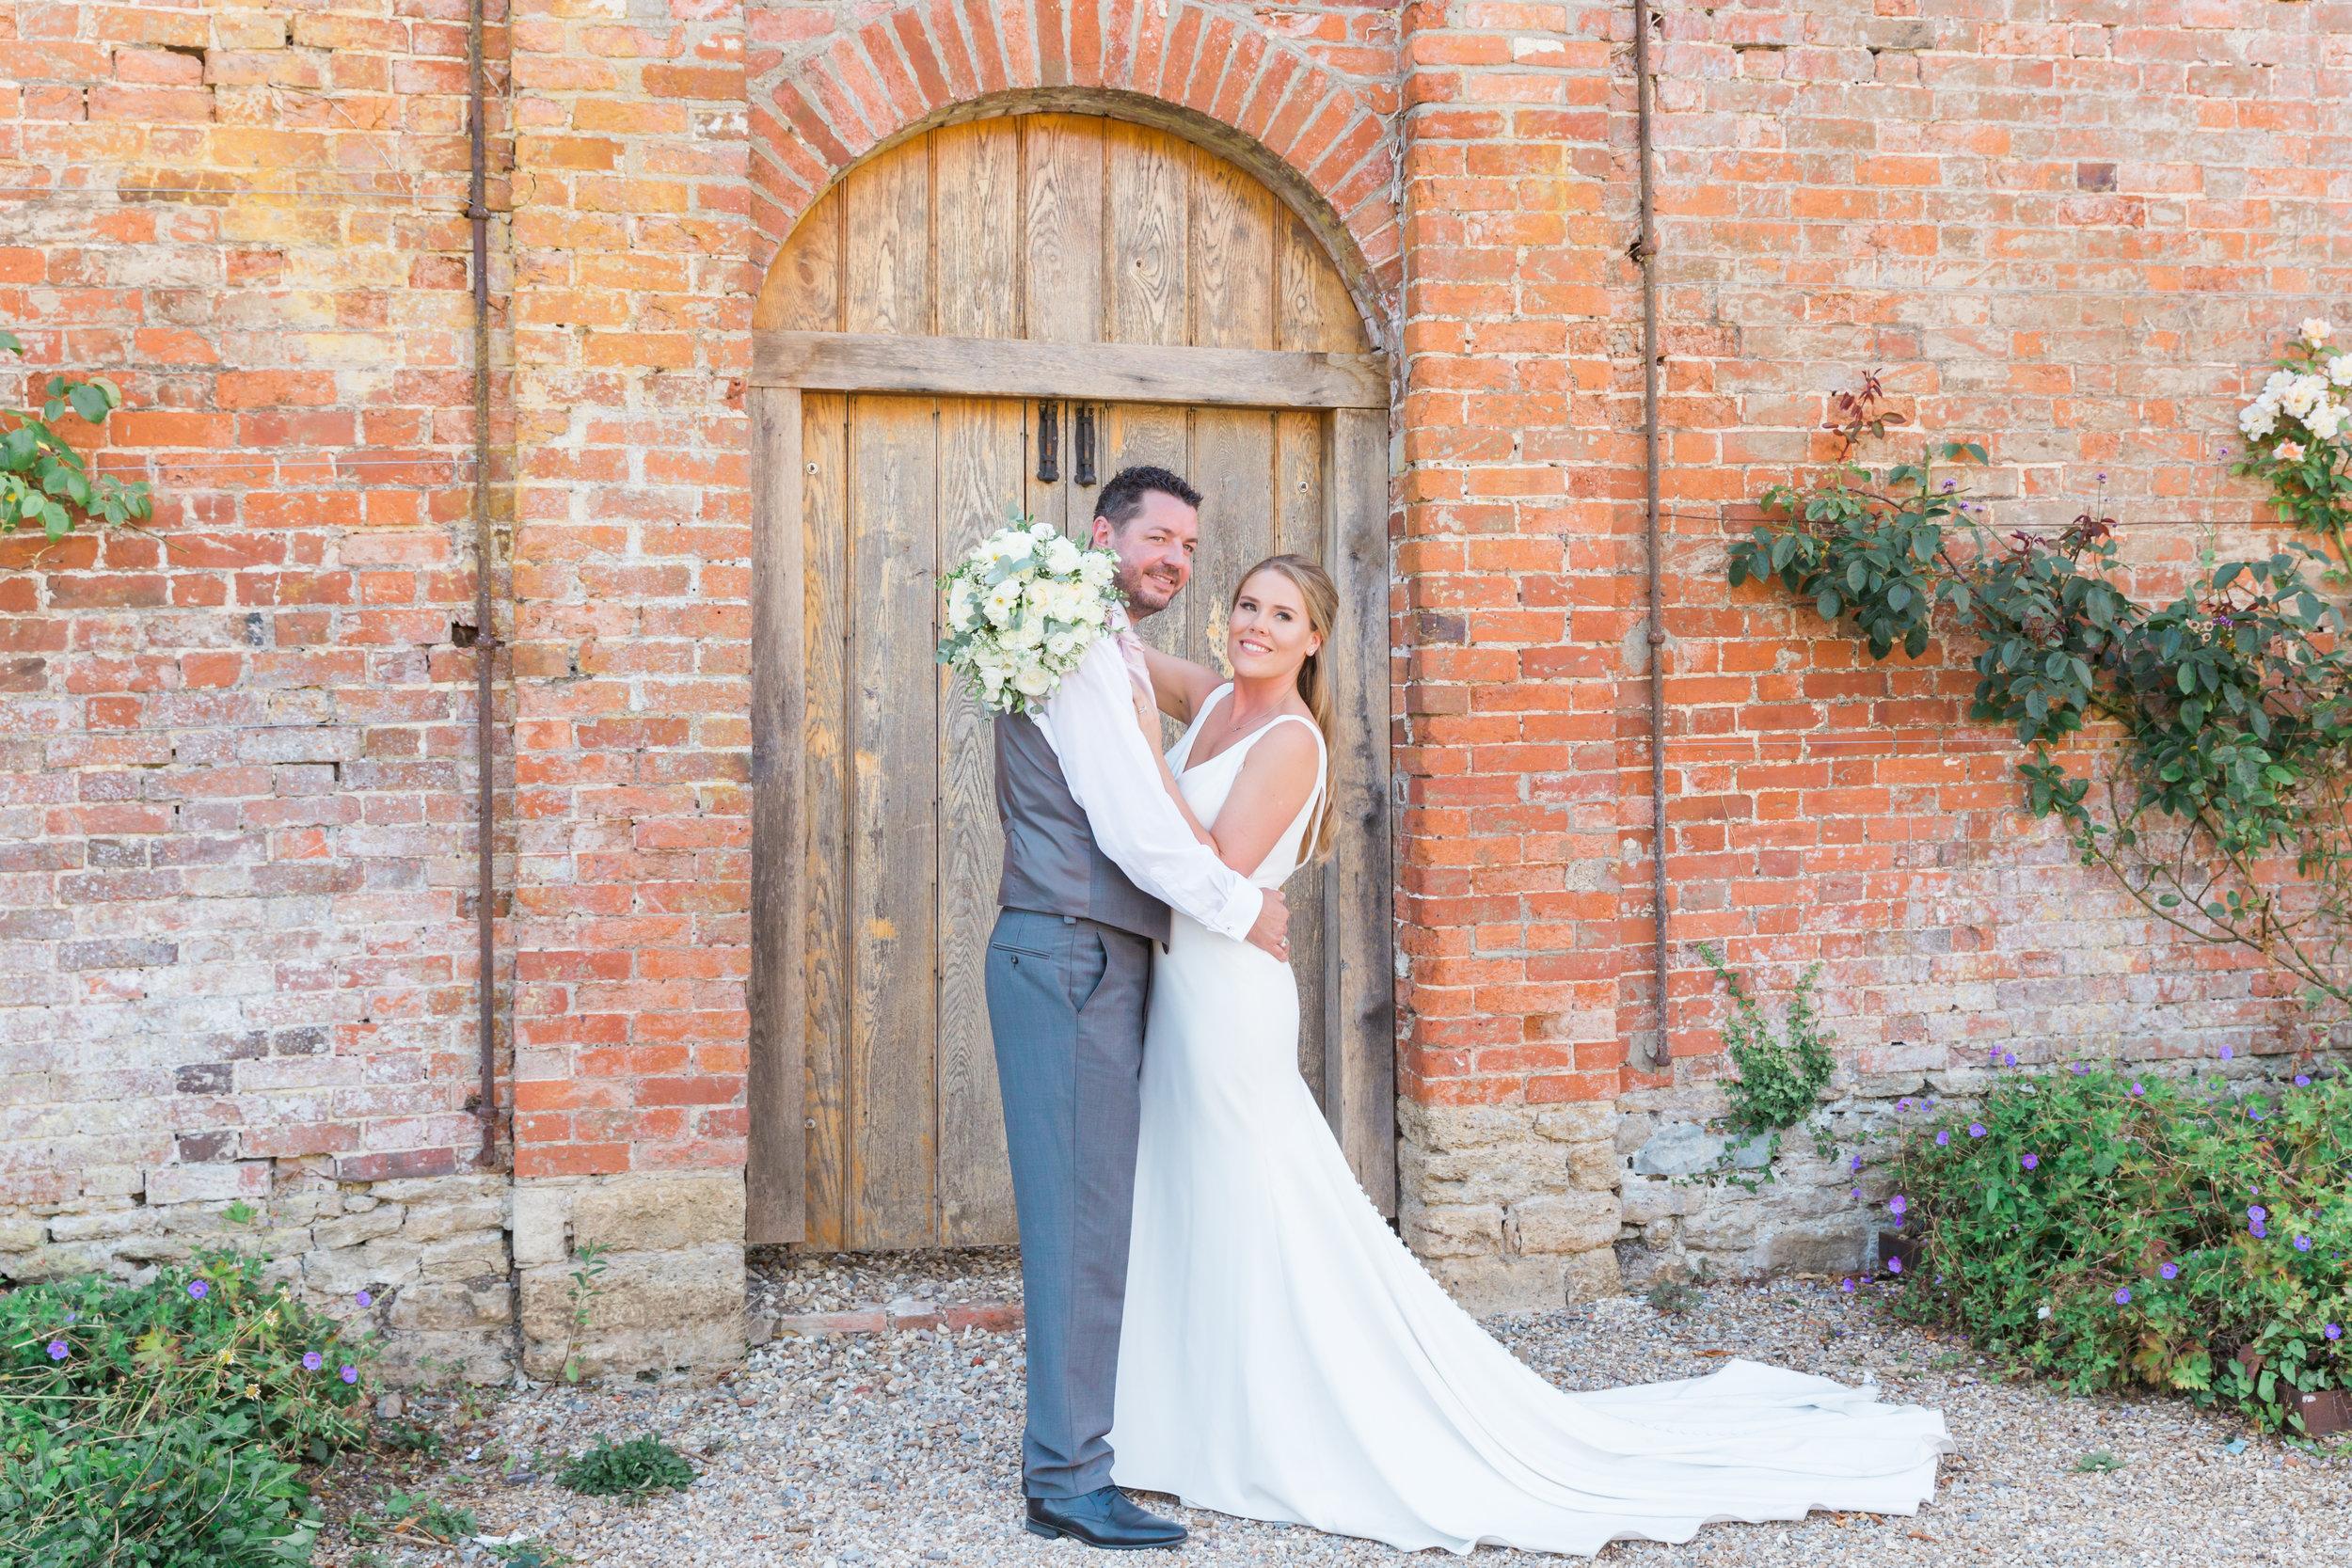 weddings at orchardleigh estate.jpg